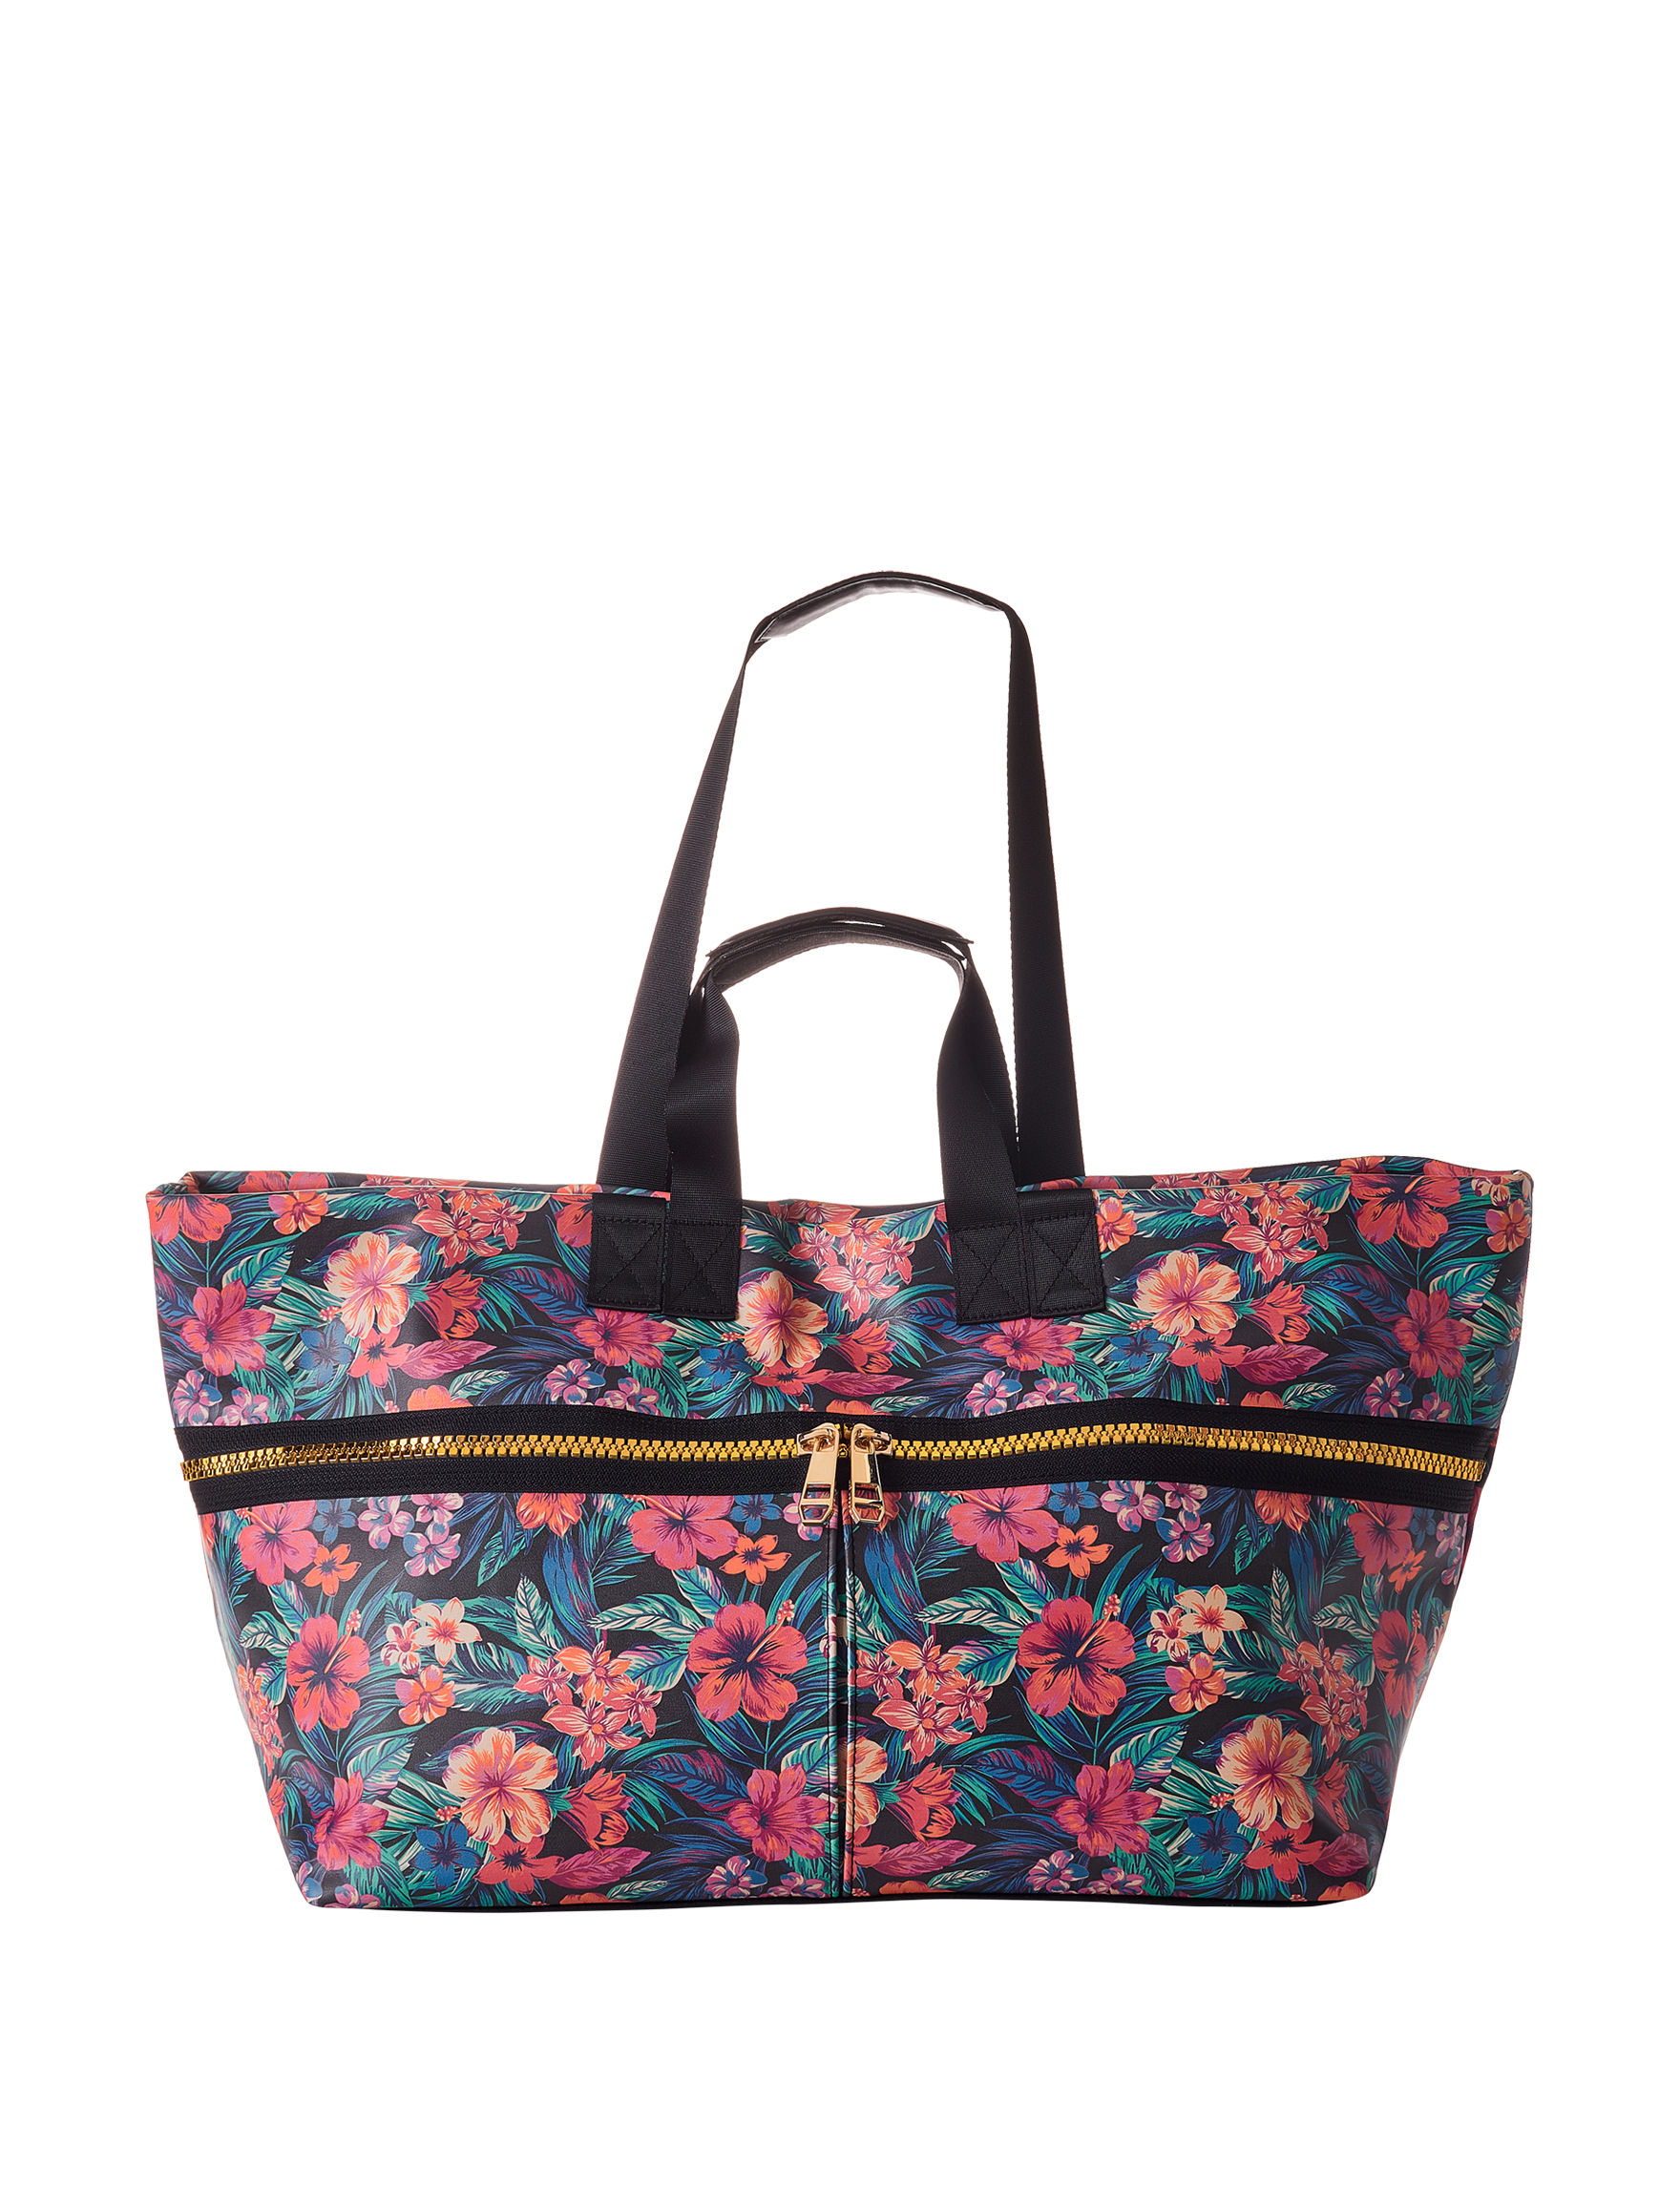 Madden Girl Black Floral Weekend Bags